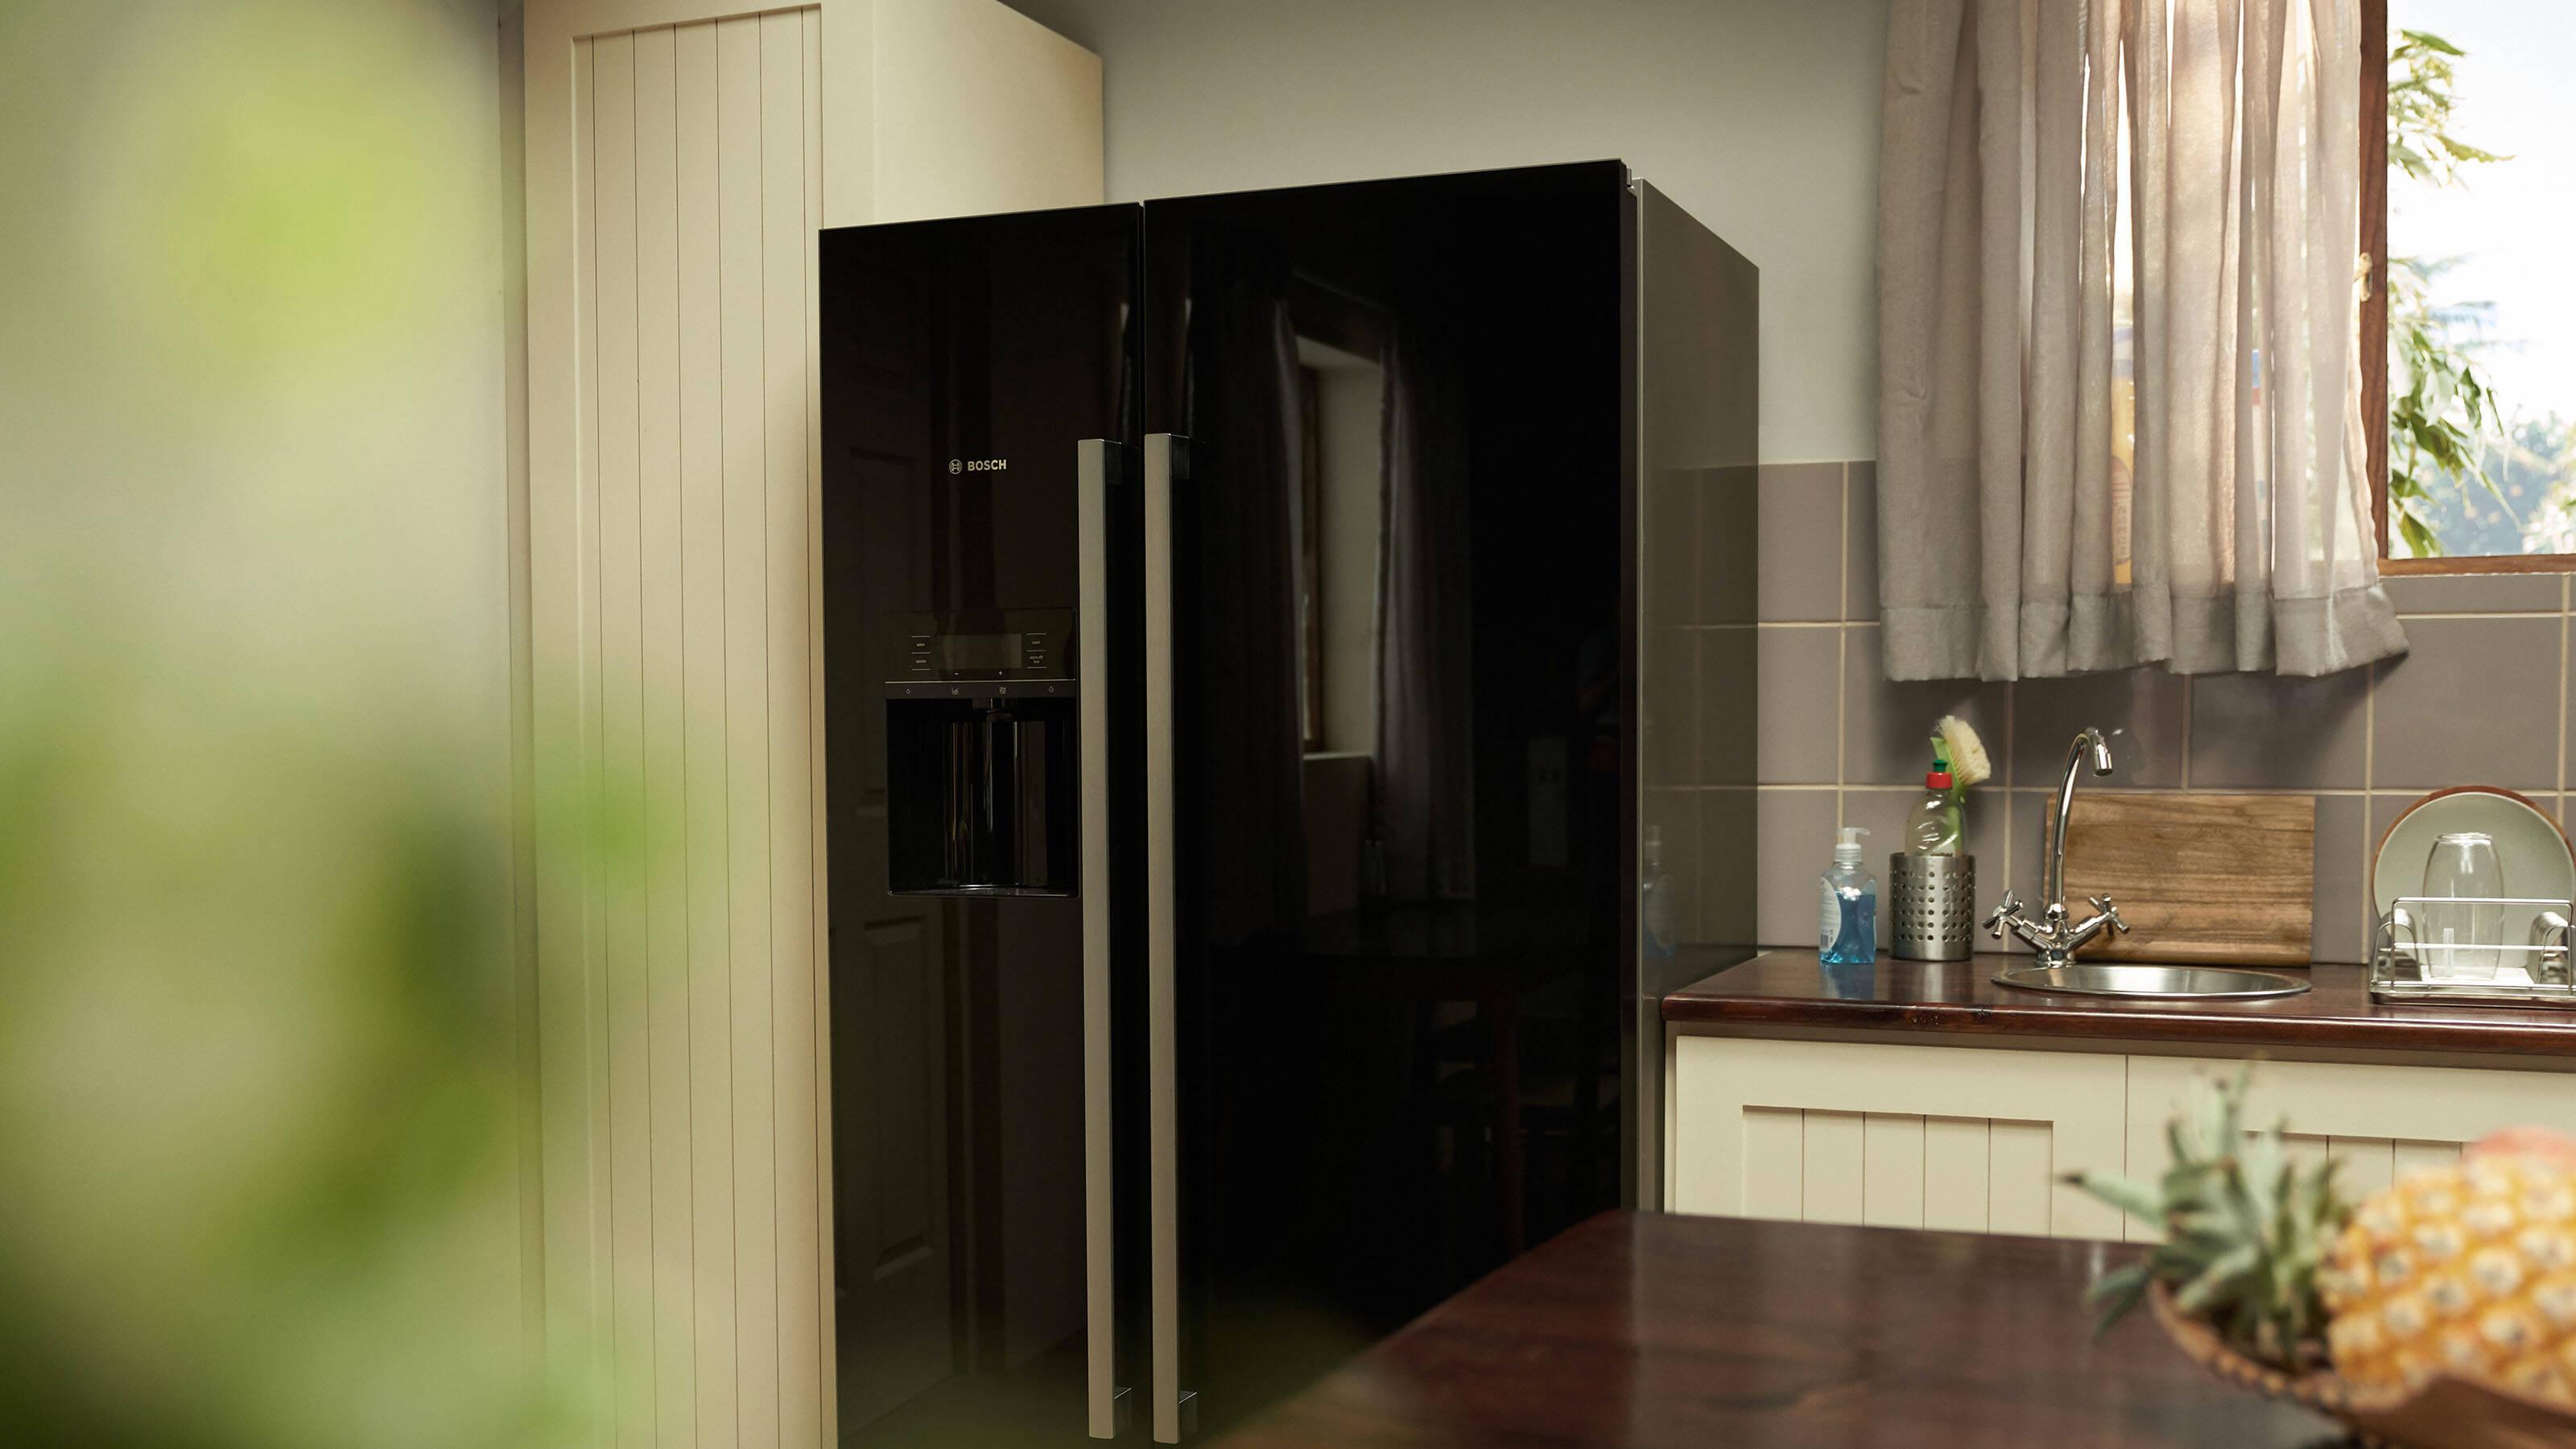 Bosch Kühlschrank Doppelt : Kühlschrank side by side bosch global